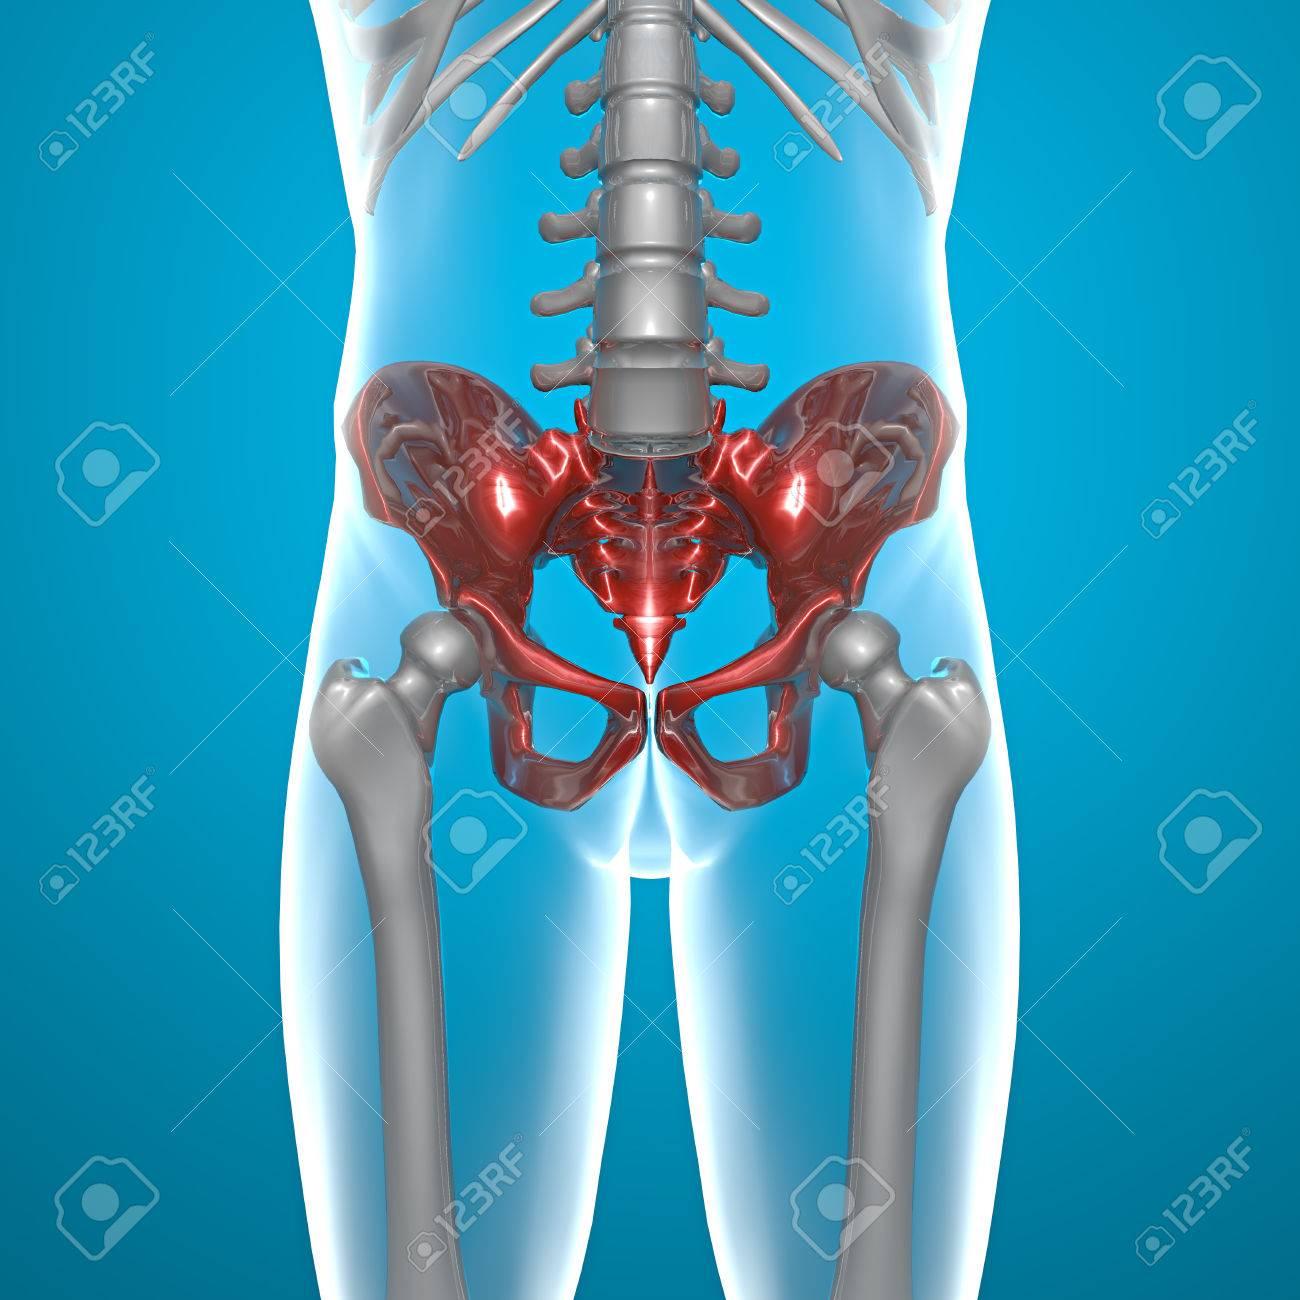 Becken Becken Menschlichen Körper X-ray Lizenzfreie Fotos, Bilder ...